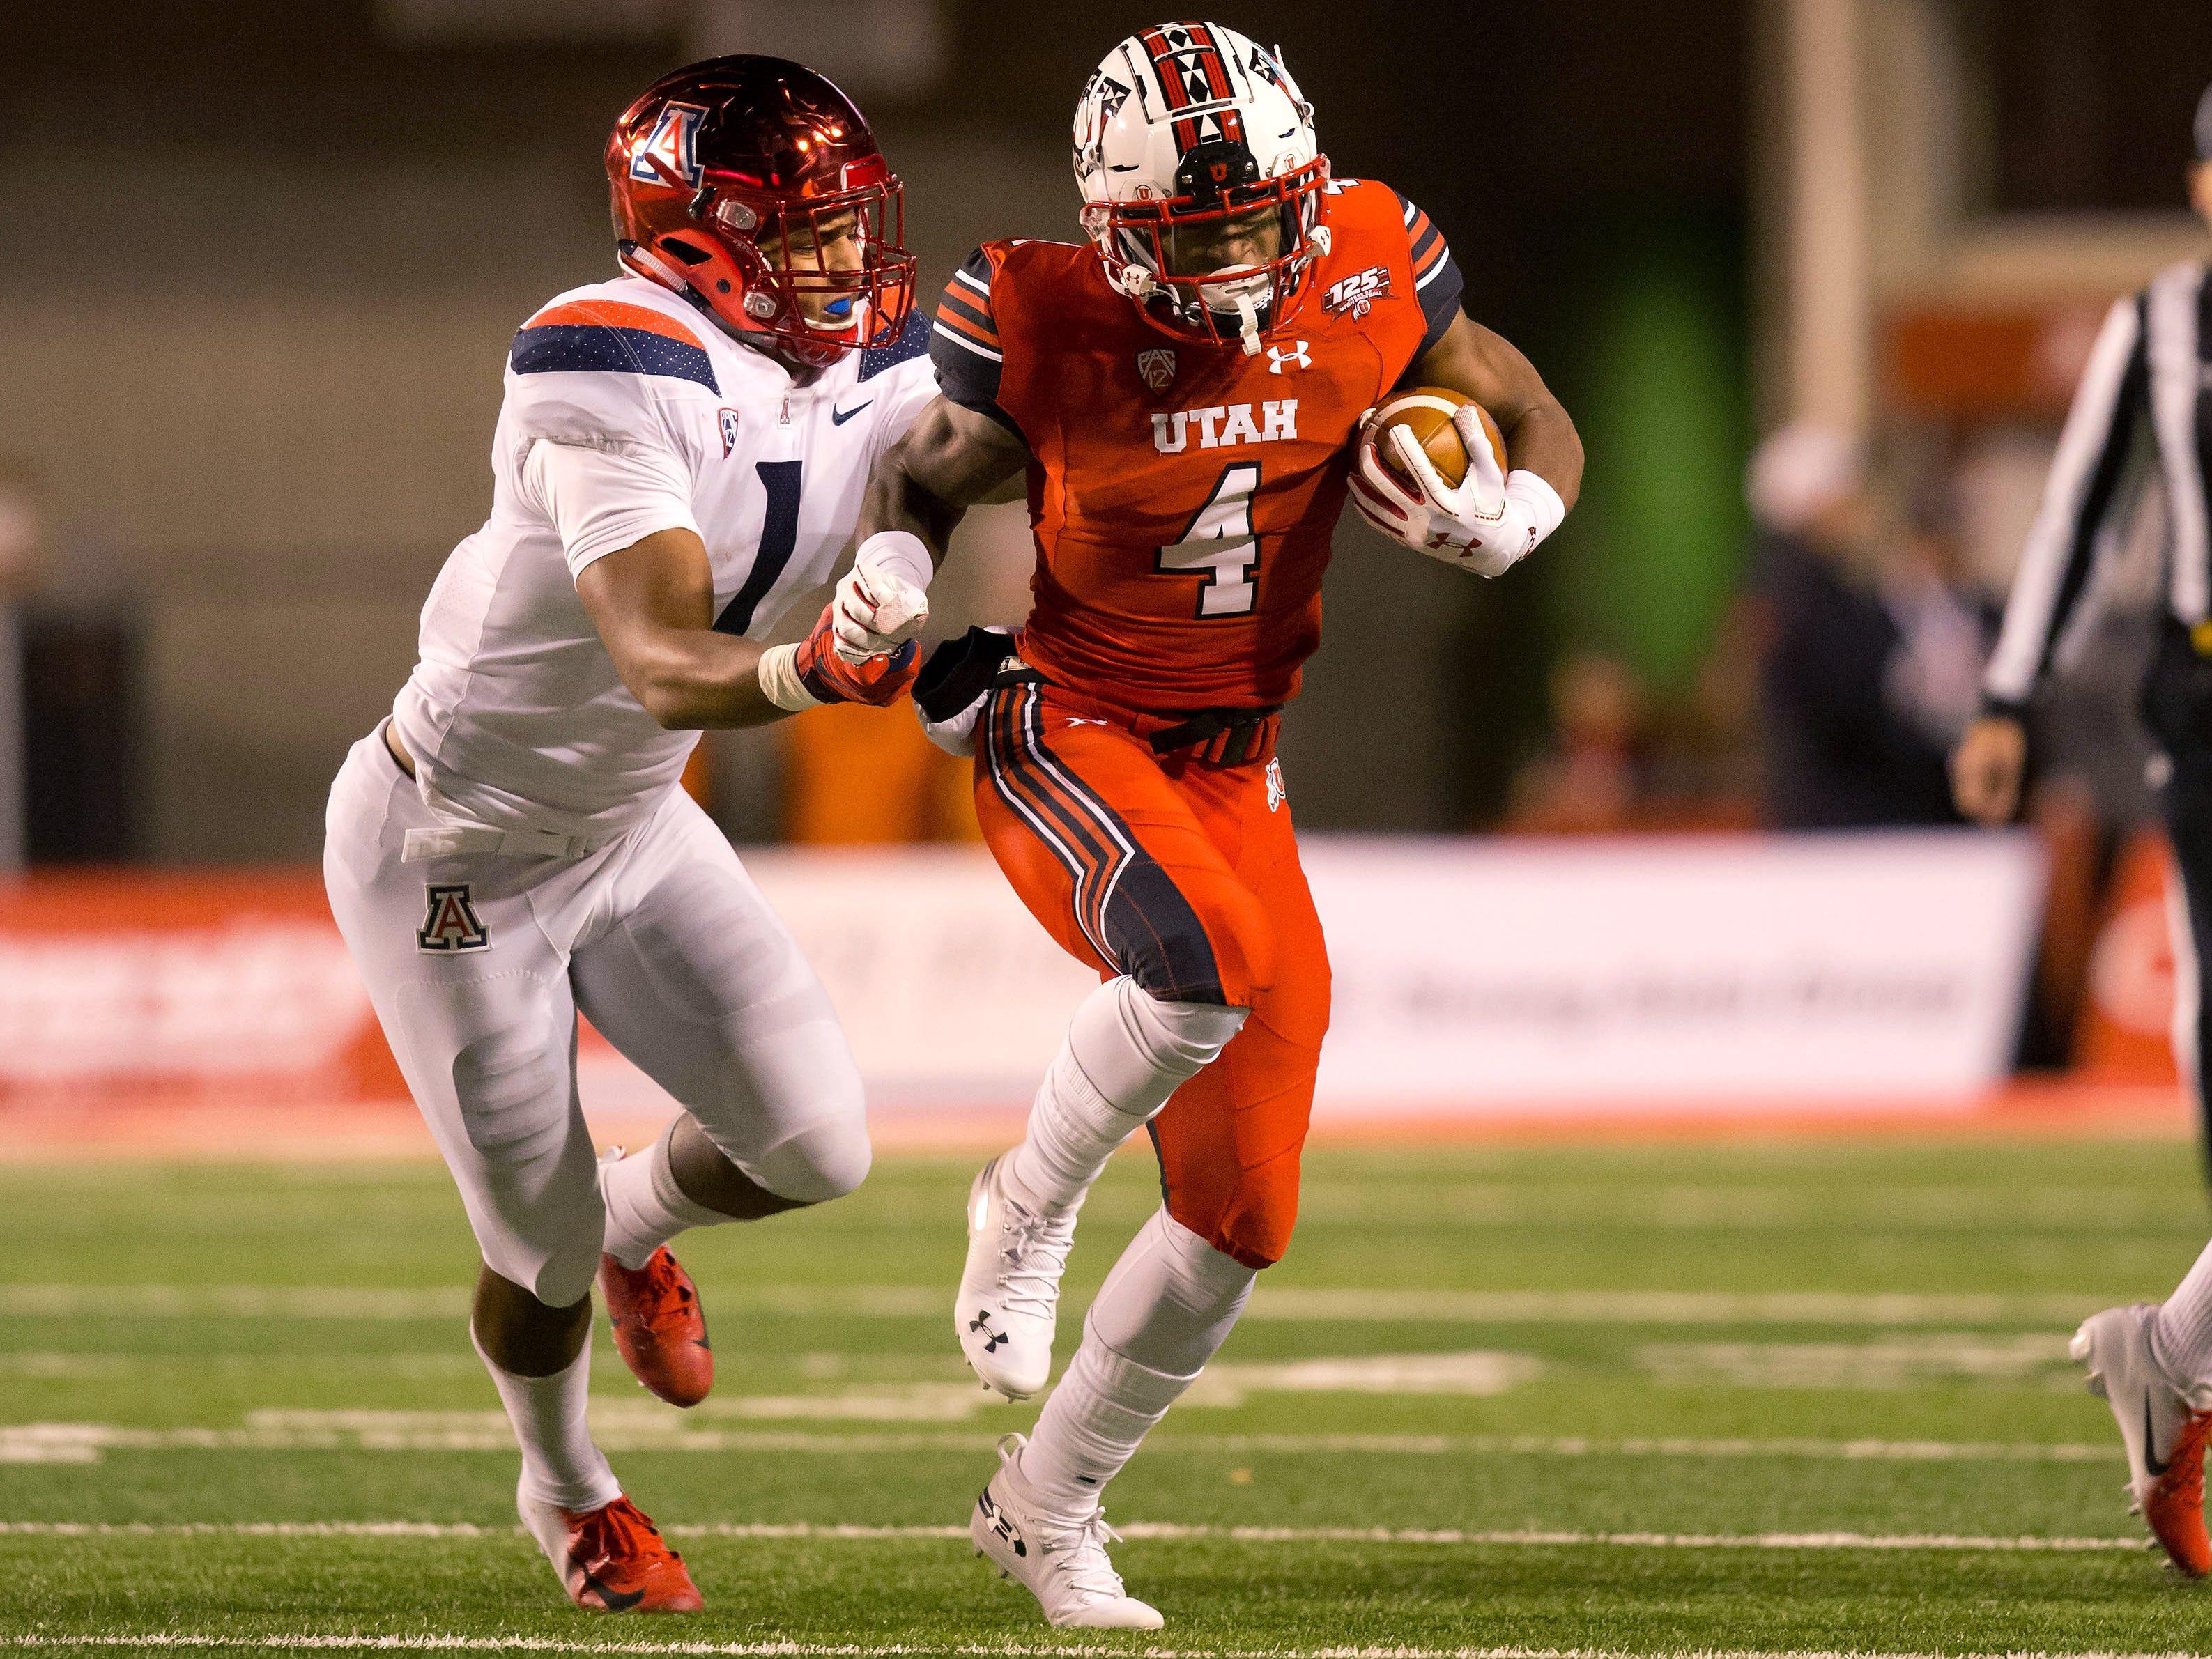 Oct 12, 2018; Salt Lake City, UT, USA; Utah Utes running back TJ Green (4) runs with the ball as Arizona Wildcats linebacker Tony Fields II (1) pursues the play during the first half at Rice-Eccles Stadium.